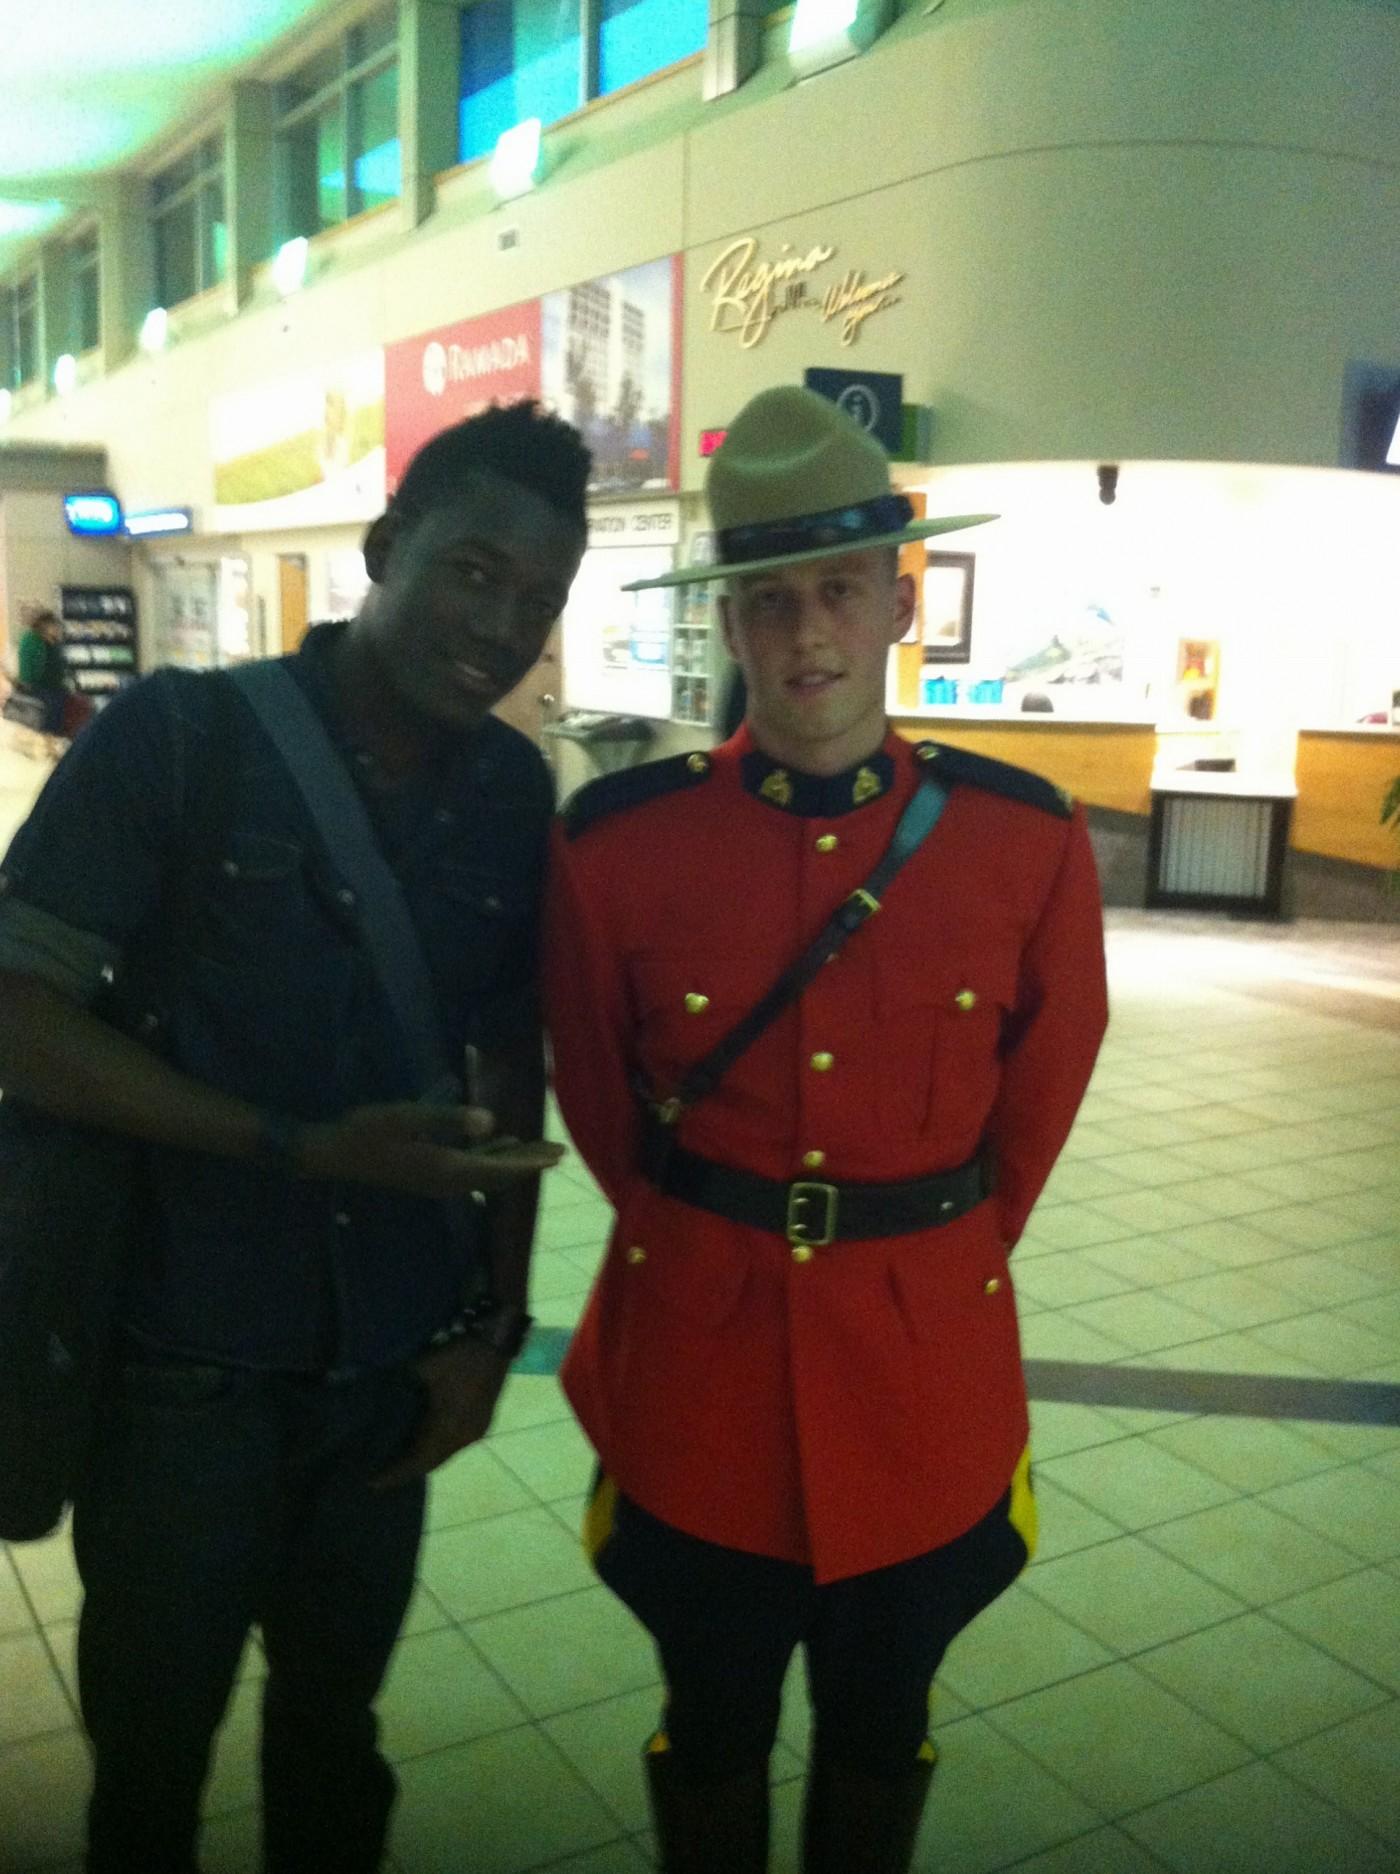 Lionel Batteur, tourne?e Kyssi We?te  Aéroport Regina  Canada juin 2013